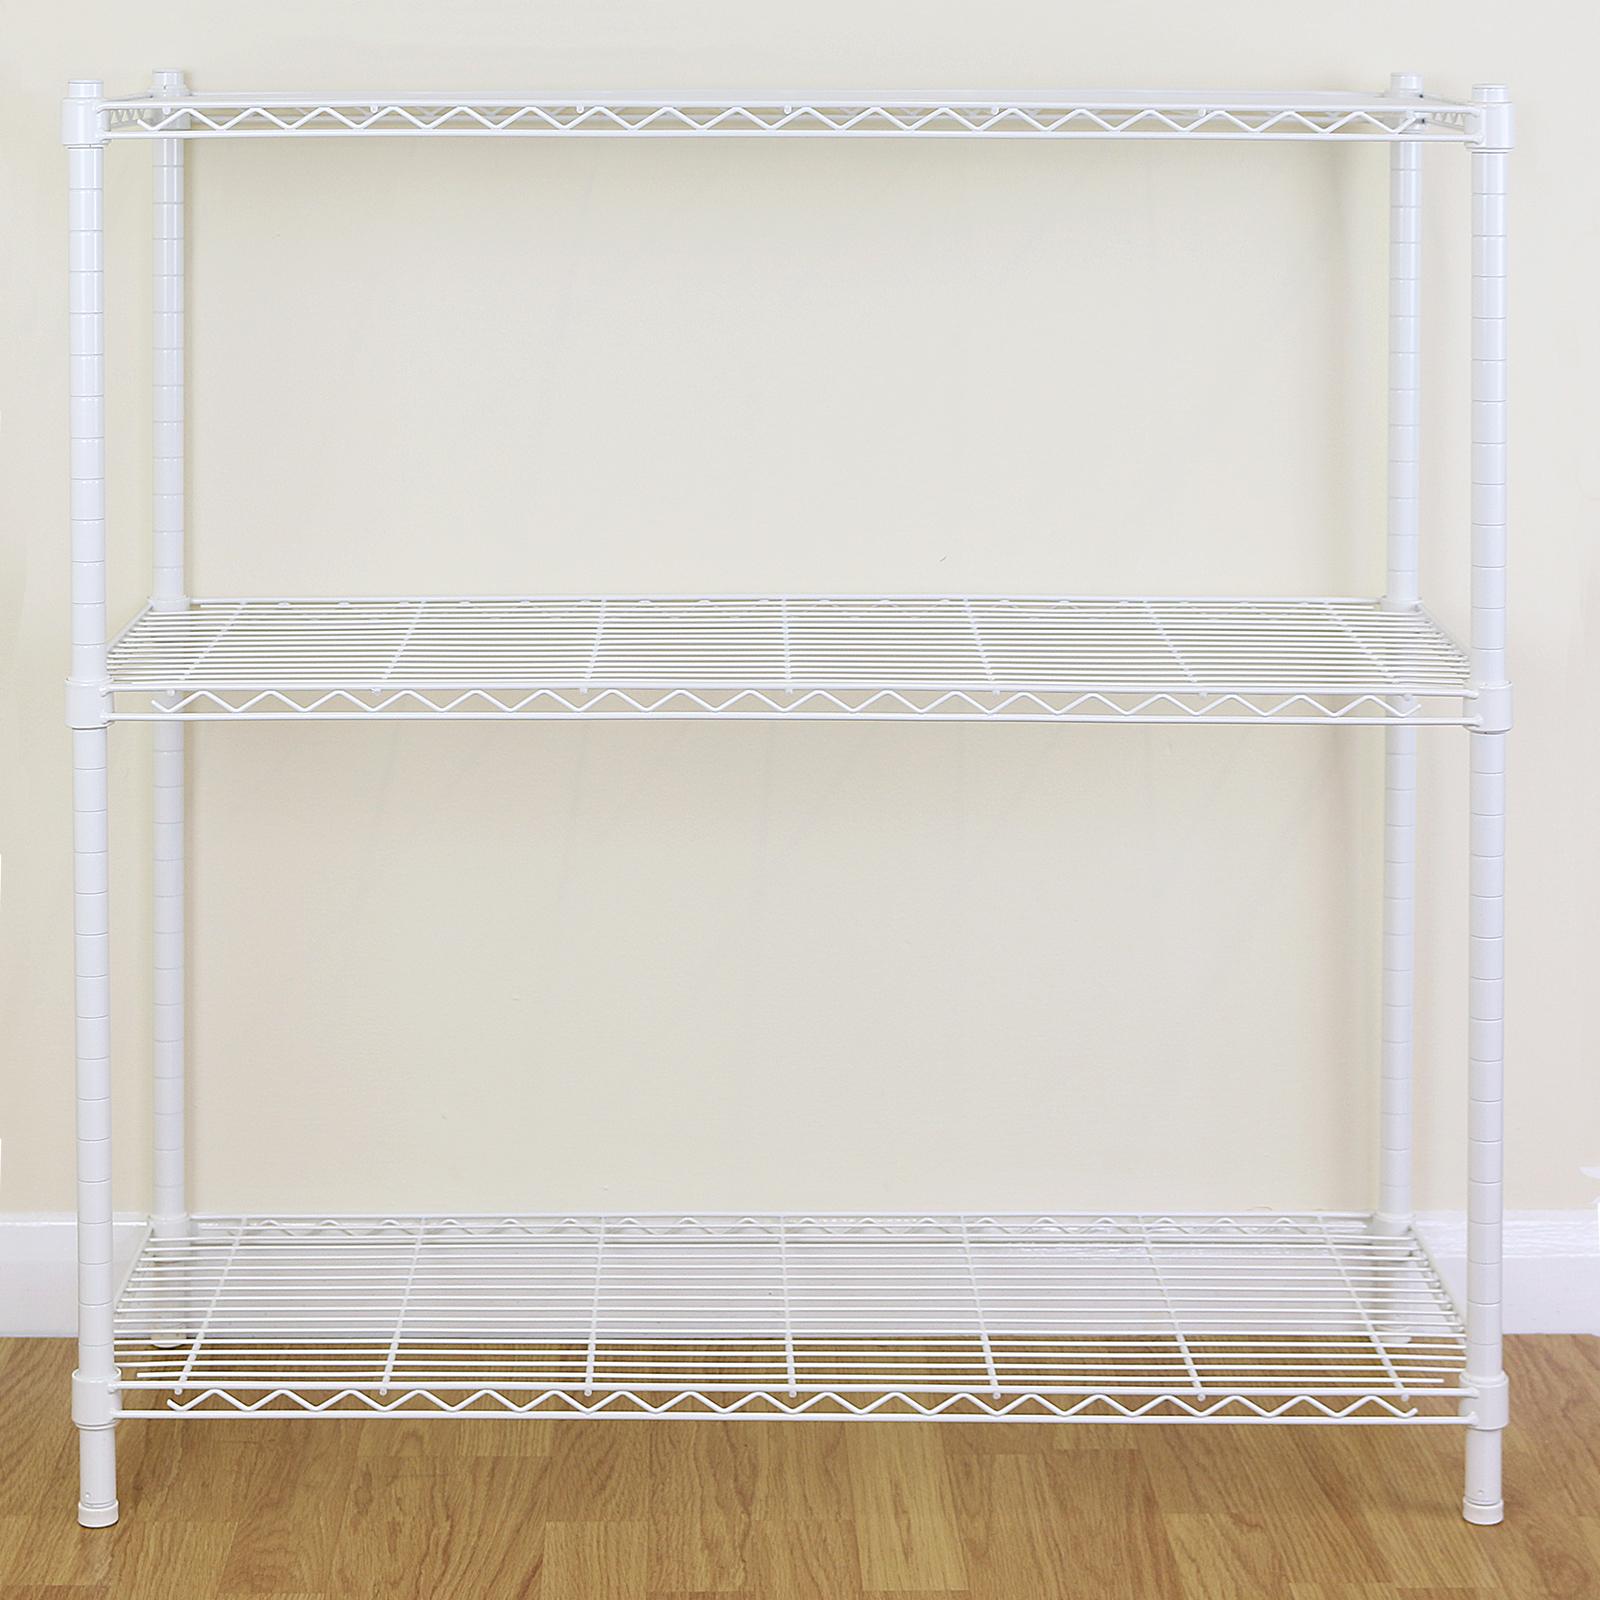 Sentinel 3 tier white metal storage rack shelving wire shelf kitchen office unit 90cm